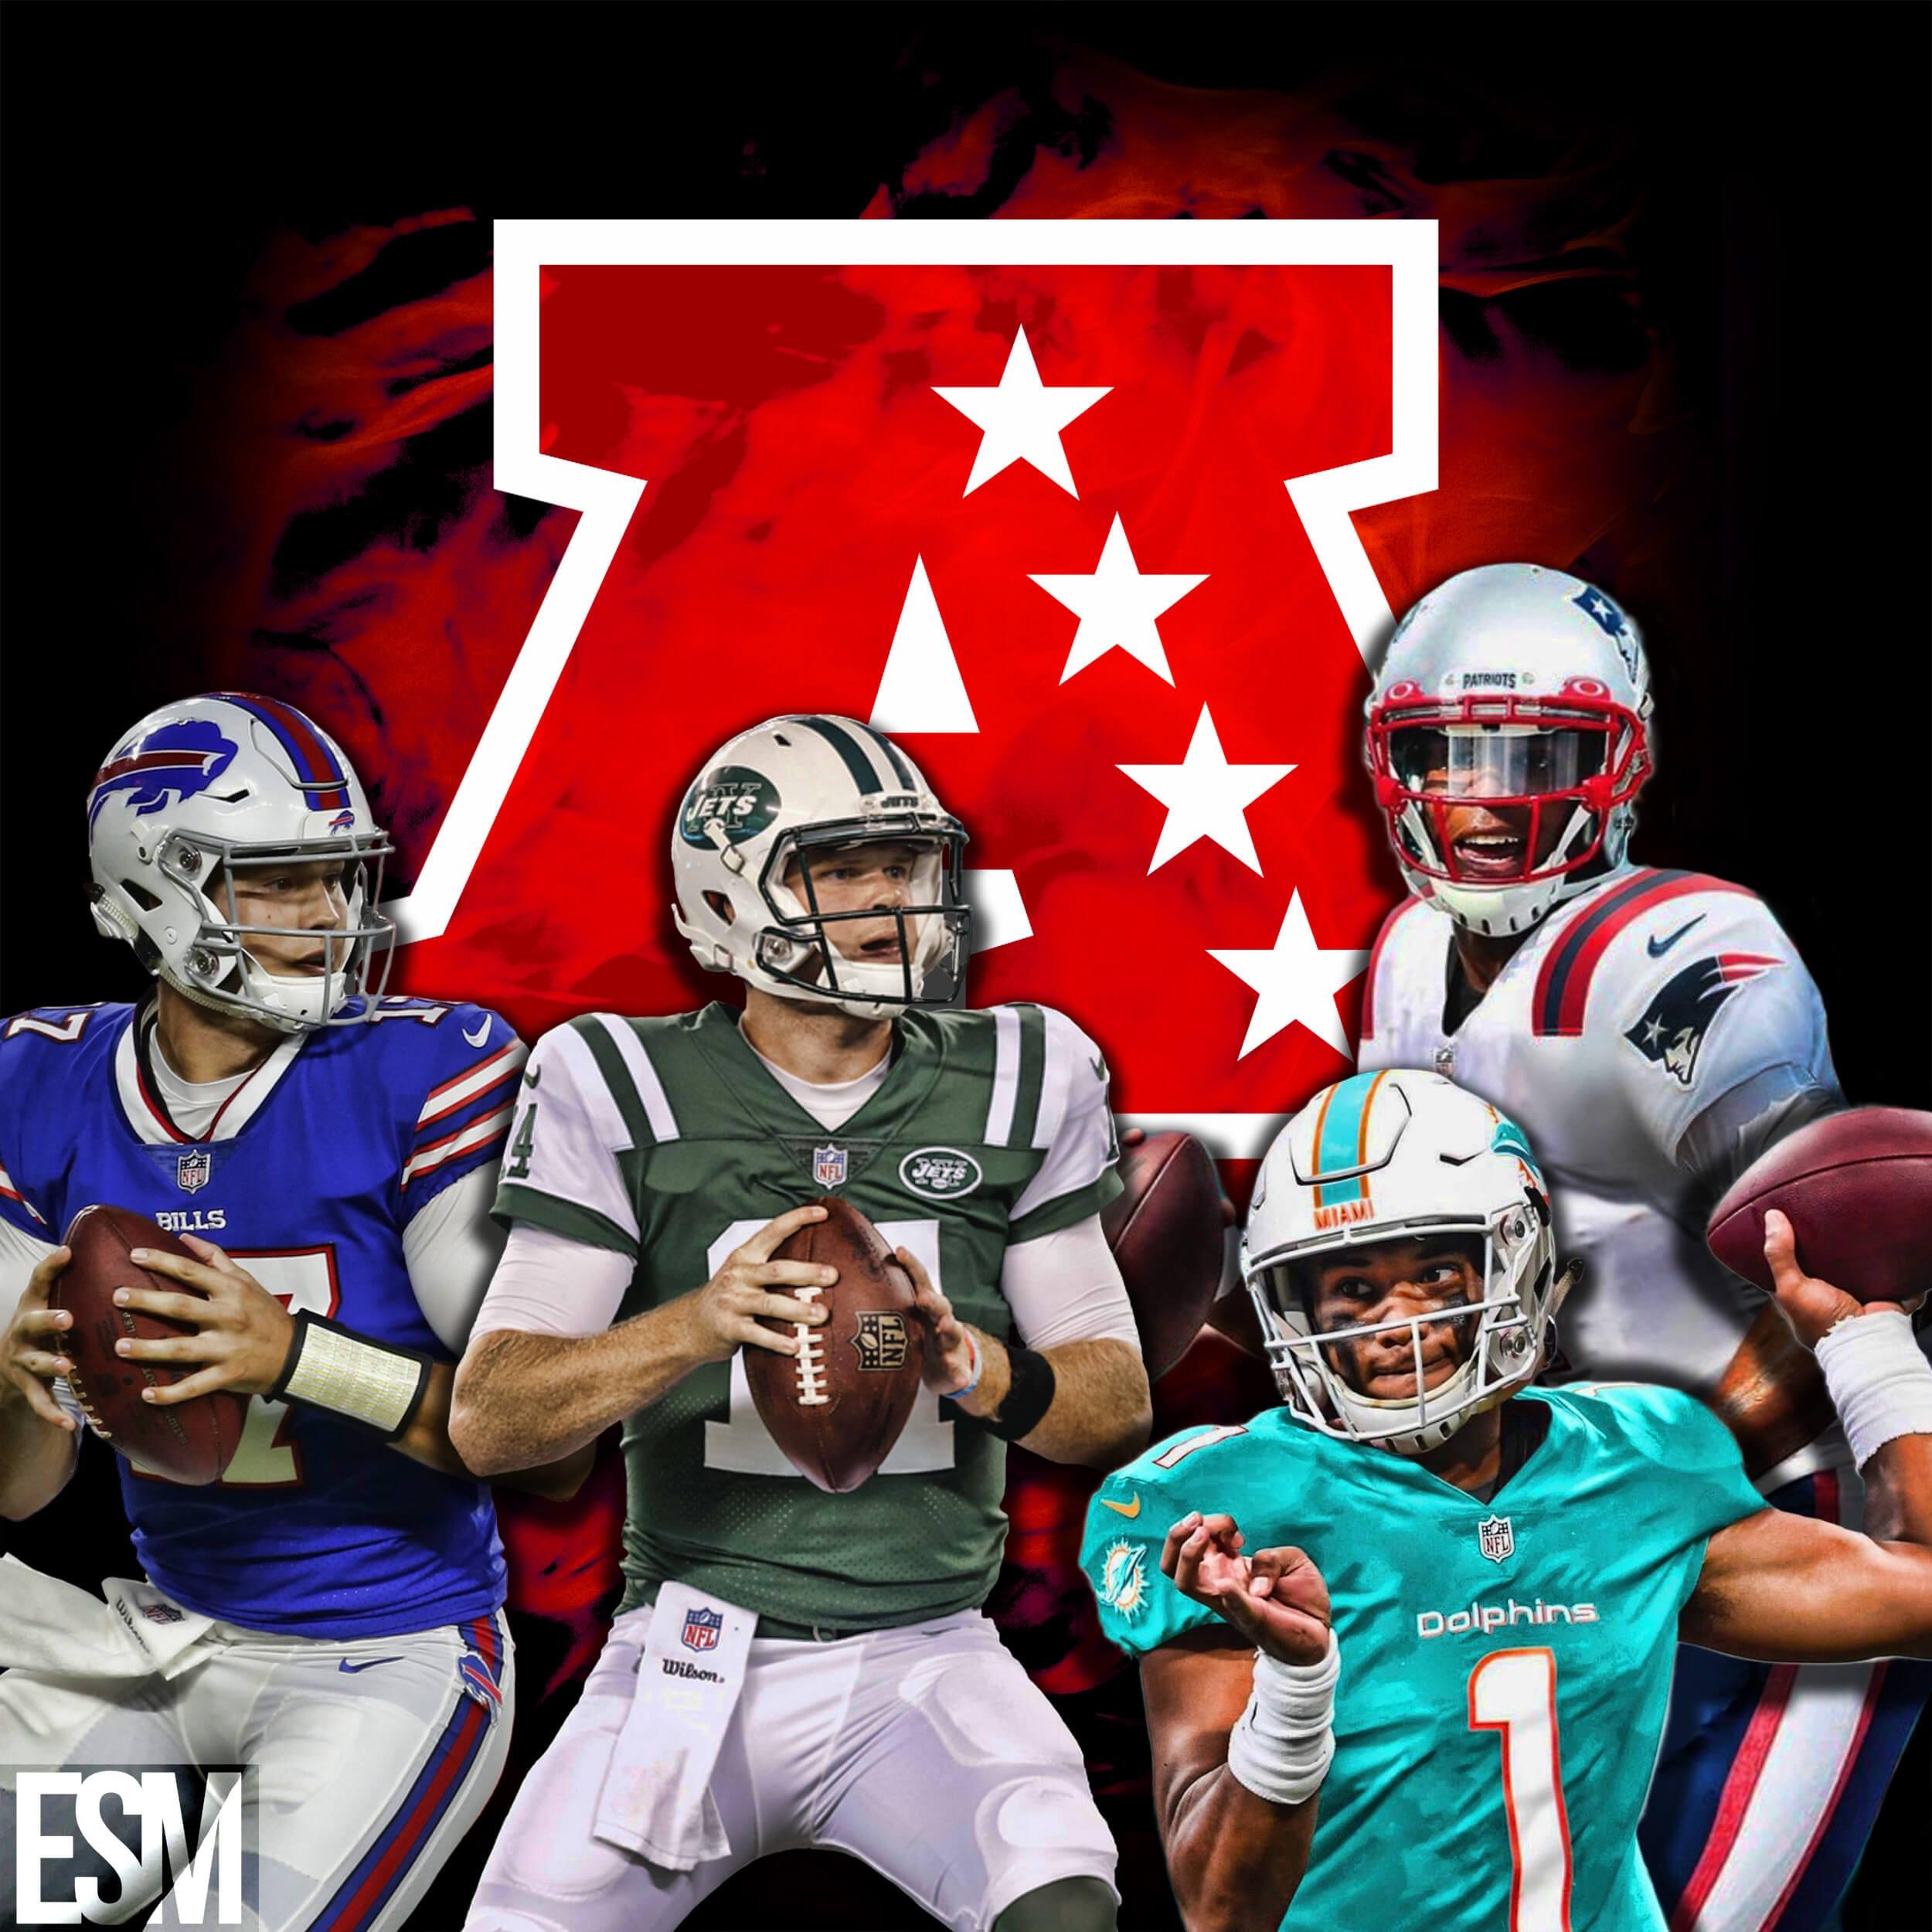 New York Jets, Miami Dolphins, Buffalo Bills, New England Patriots, Sam Darnold, Tua Tagaviola, Cam Newton